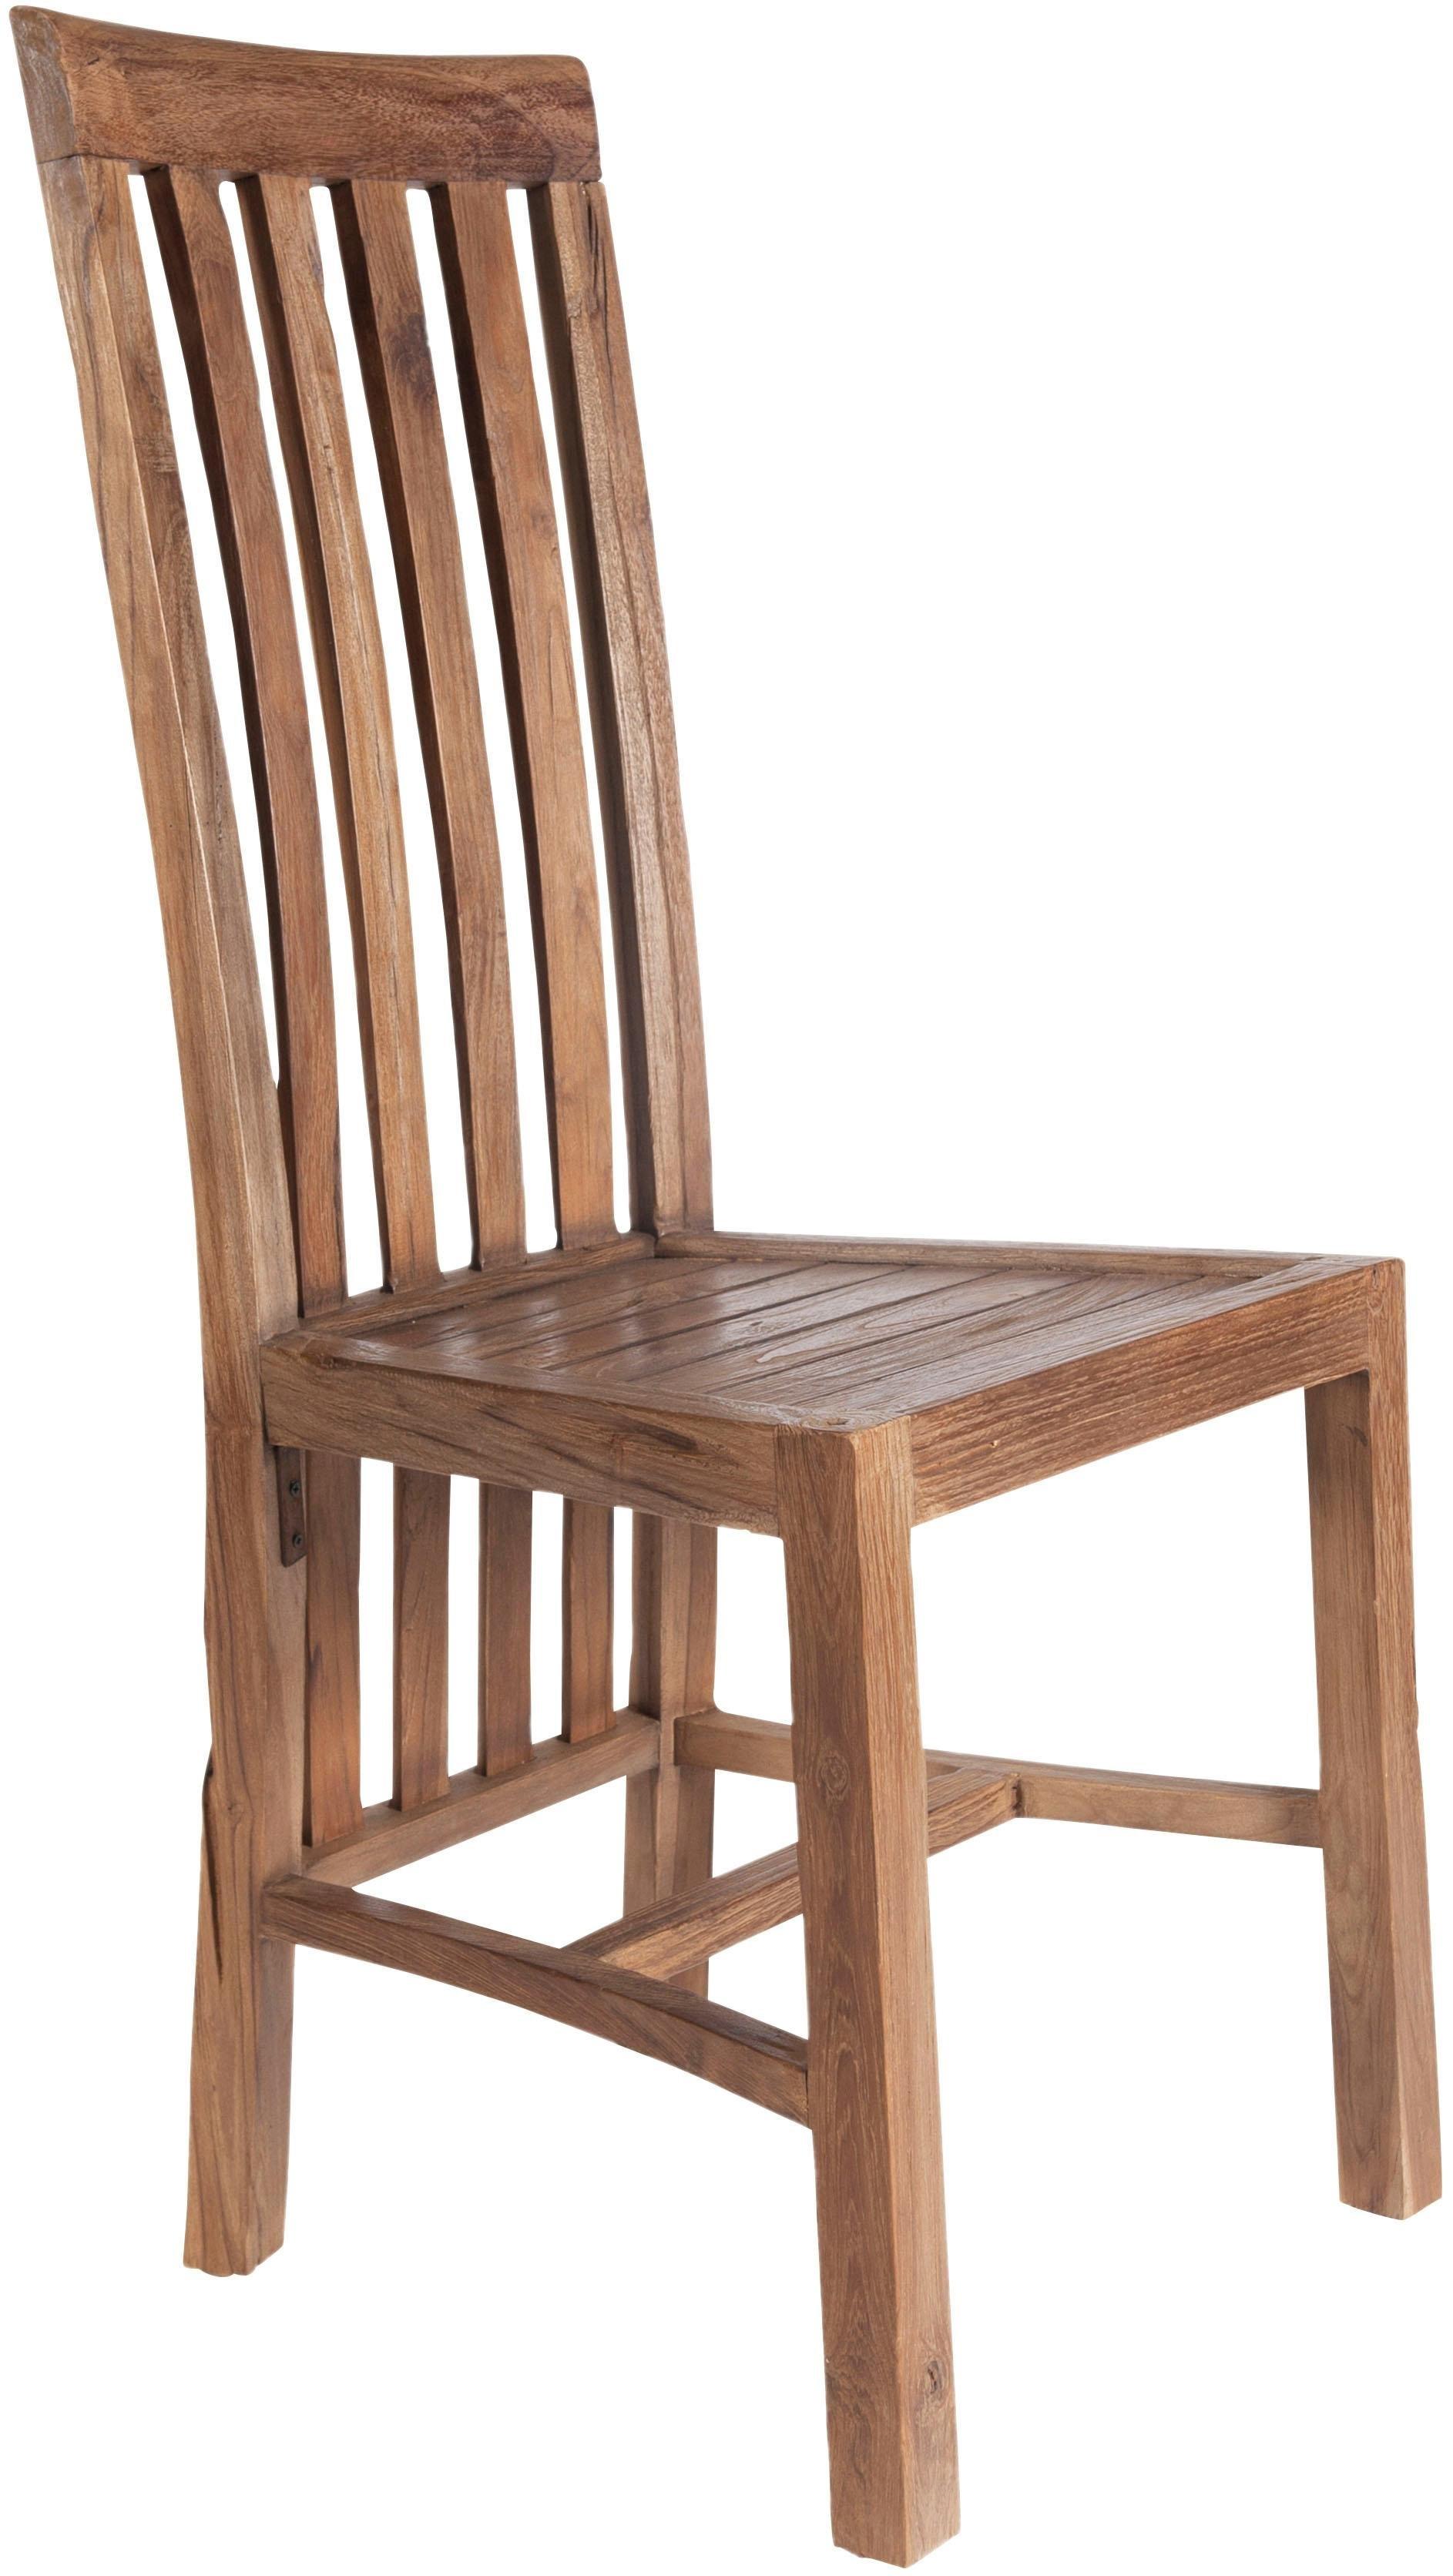 SIT stoel Coral nu online bestellen